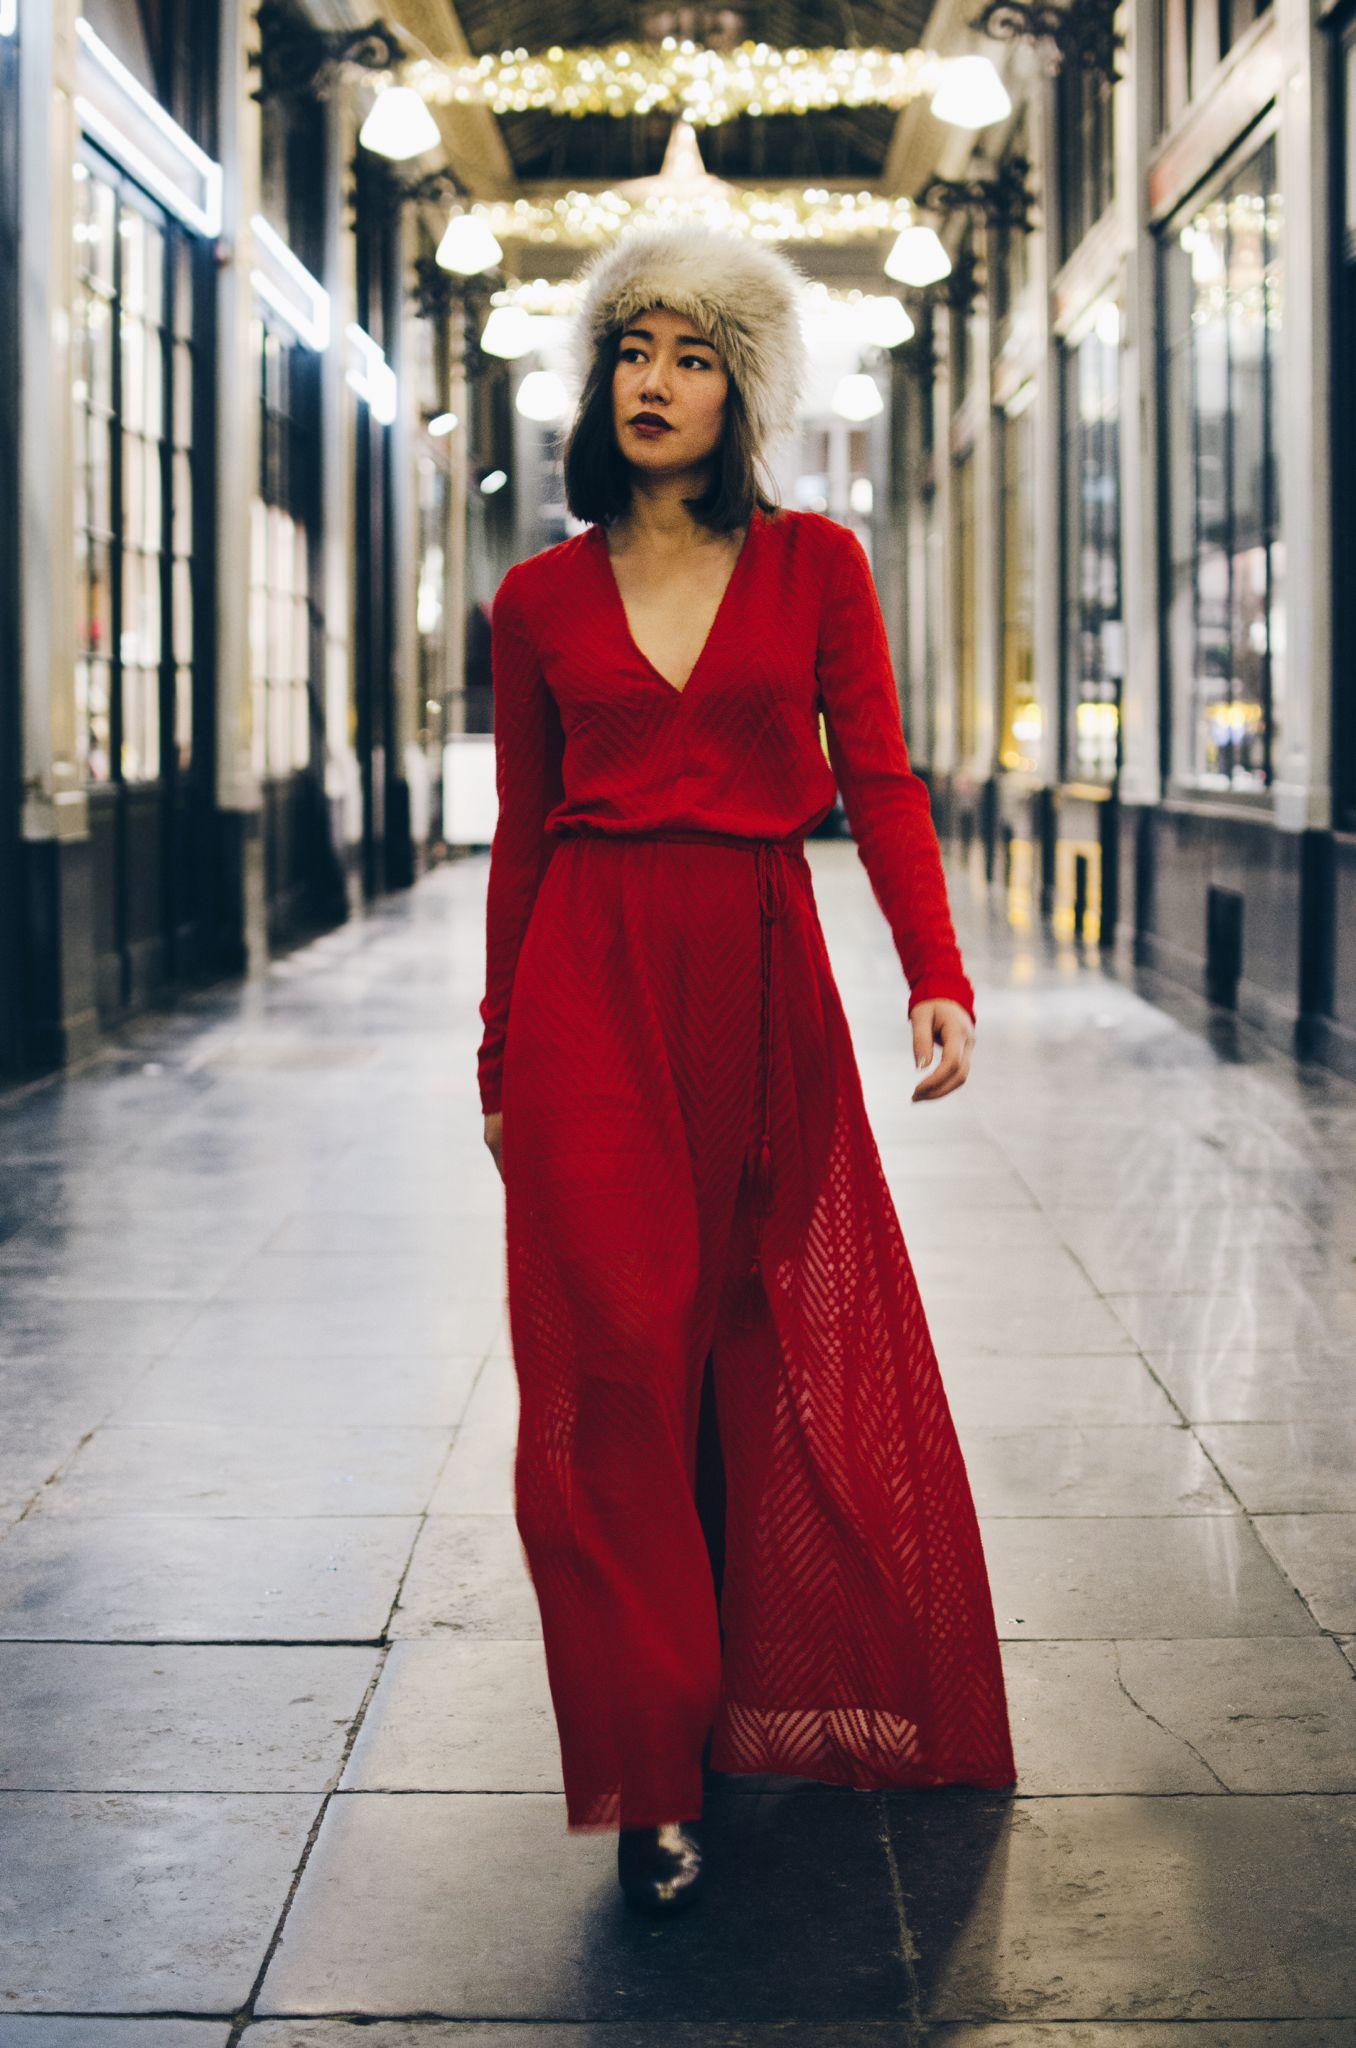 Red dress maxidress hm christmas outfit fashion longdress